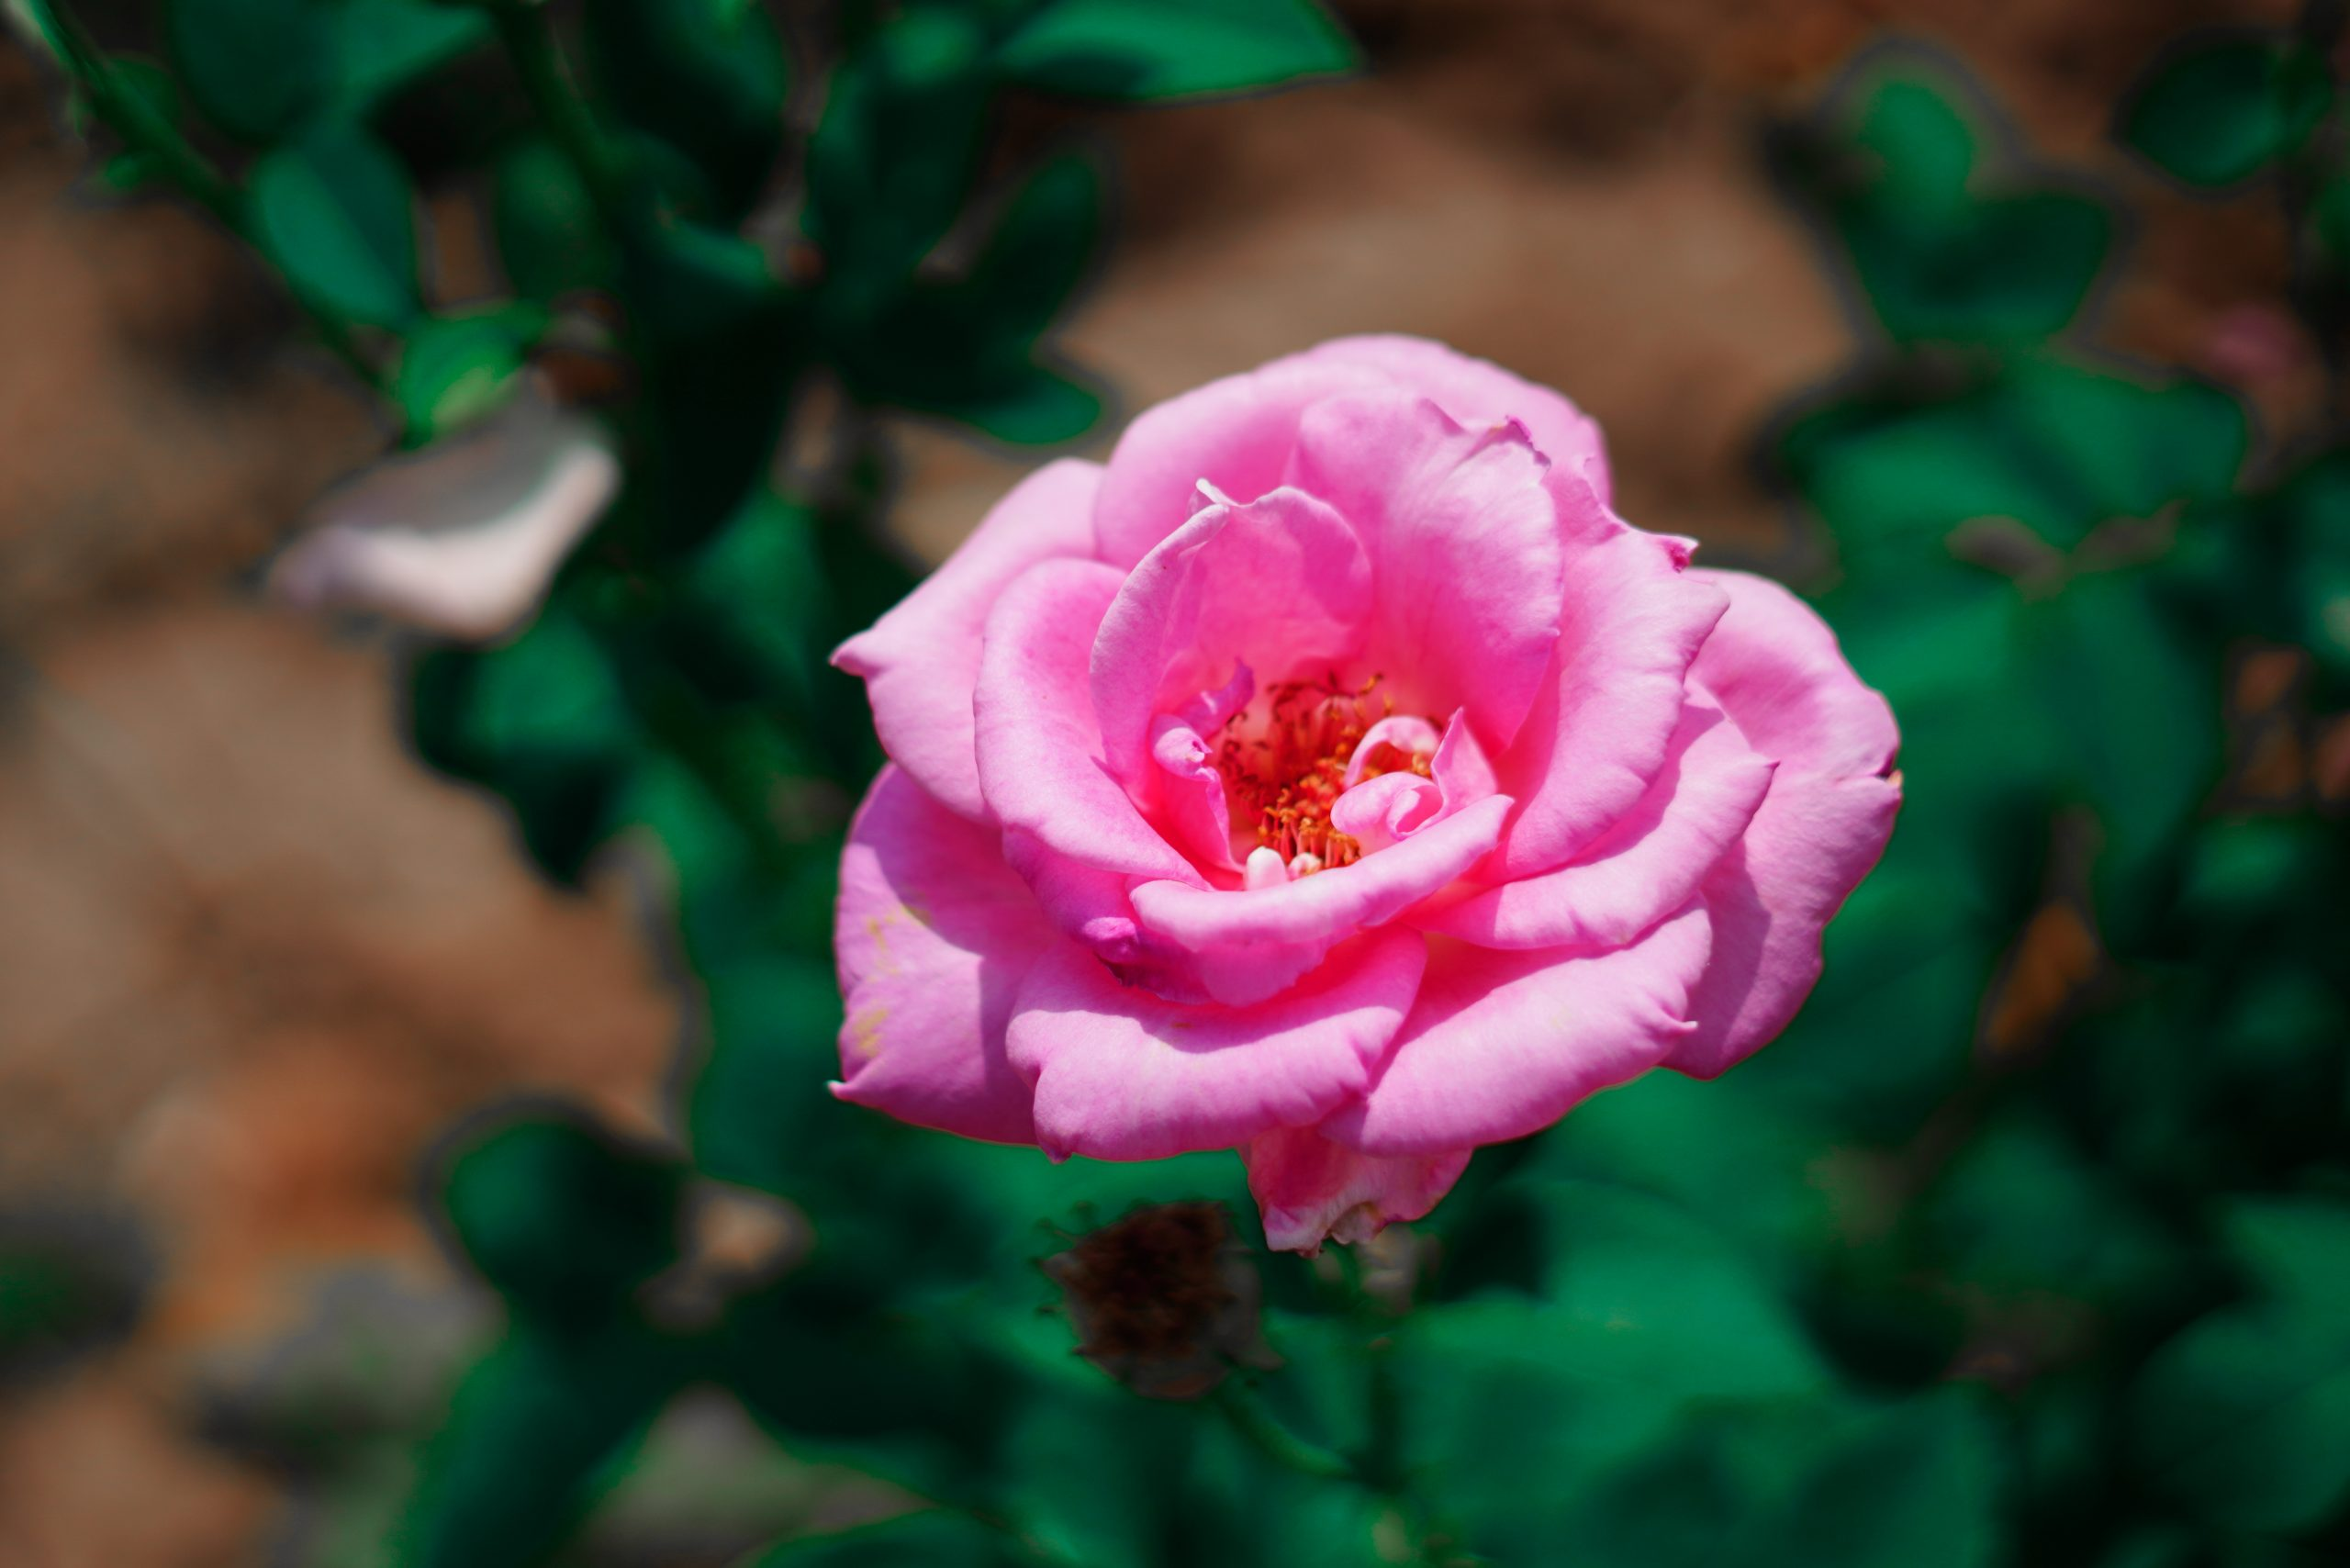 A light pink rose